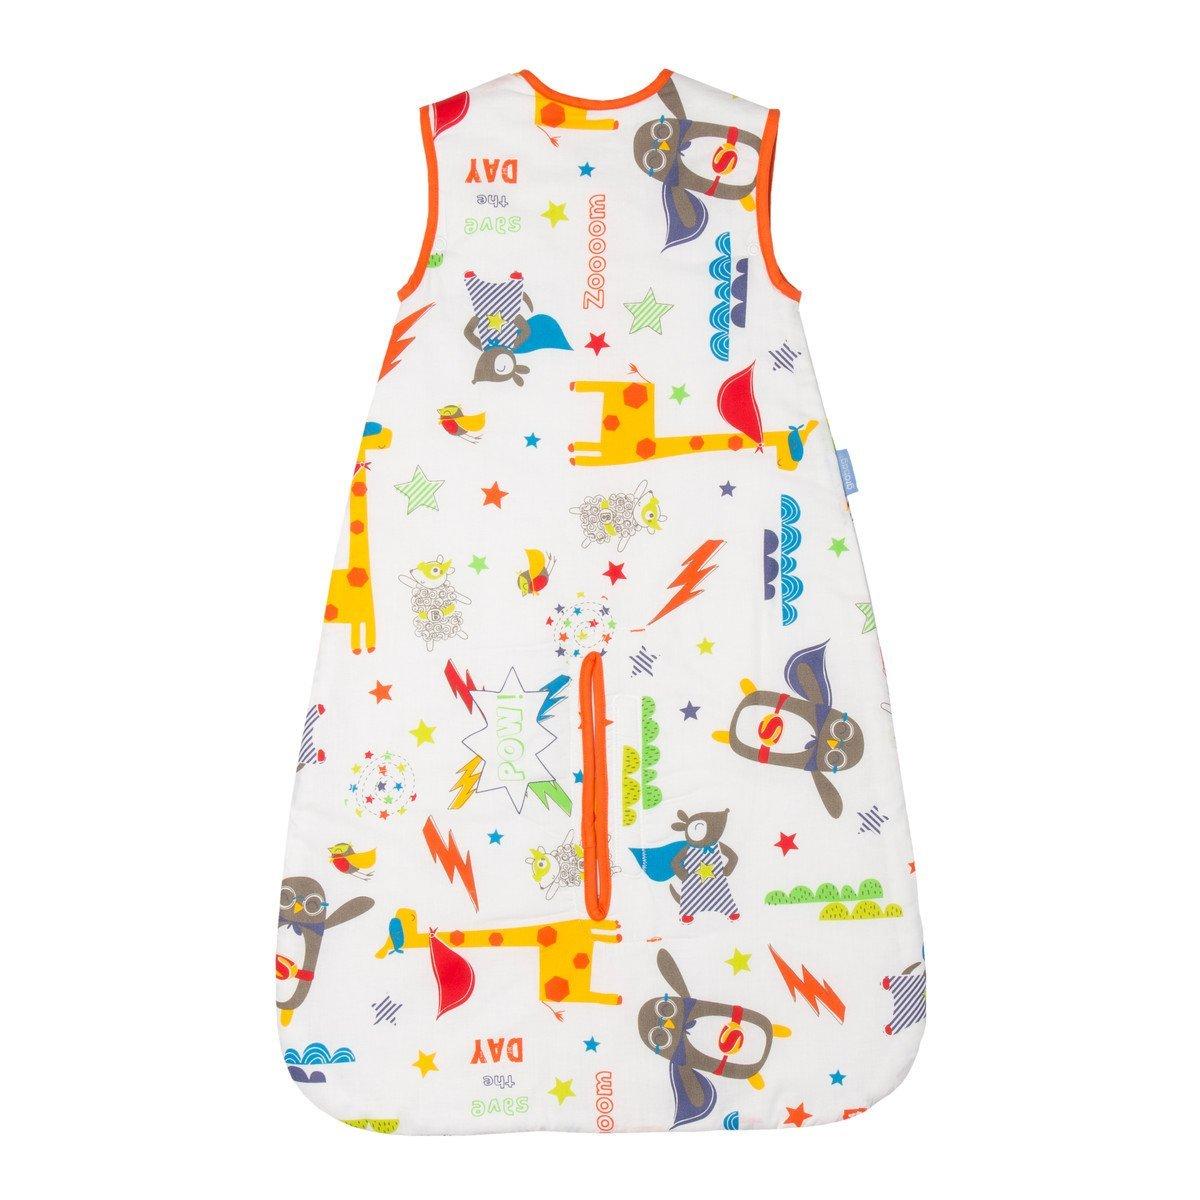 Baby Products Girls' Sleepsacks asrejanebi.com The Gro Company ...